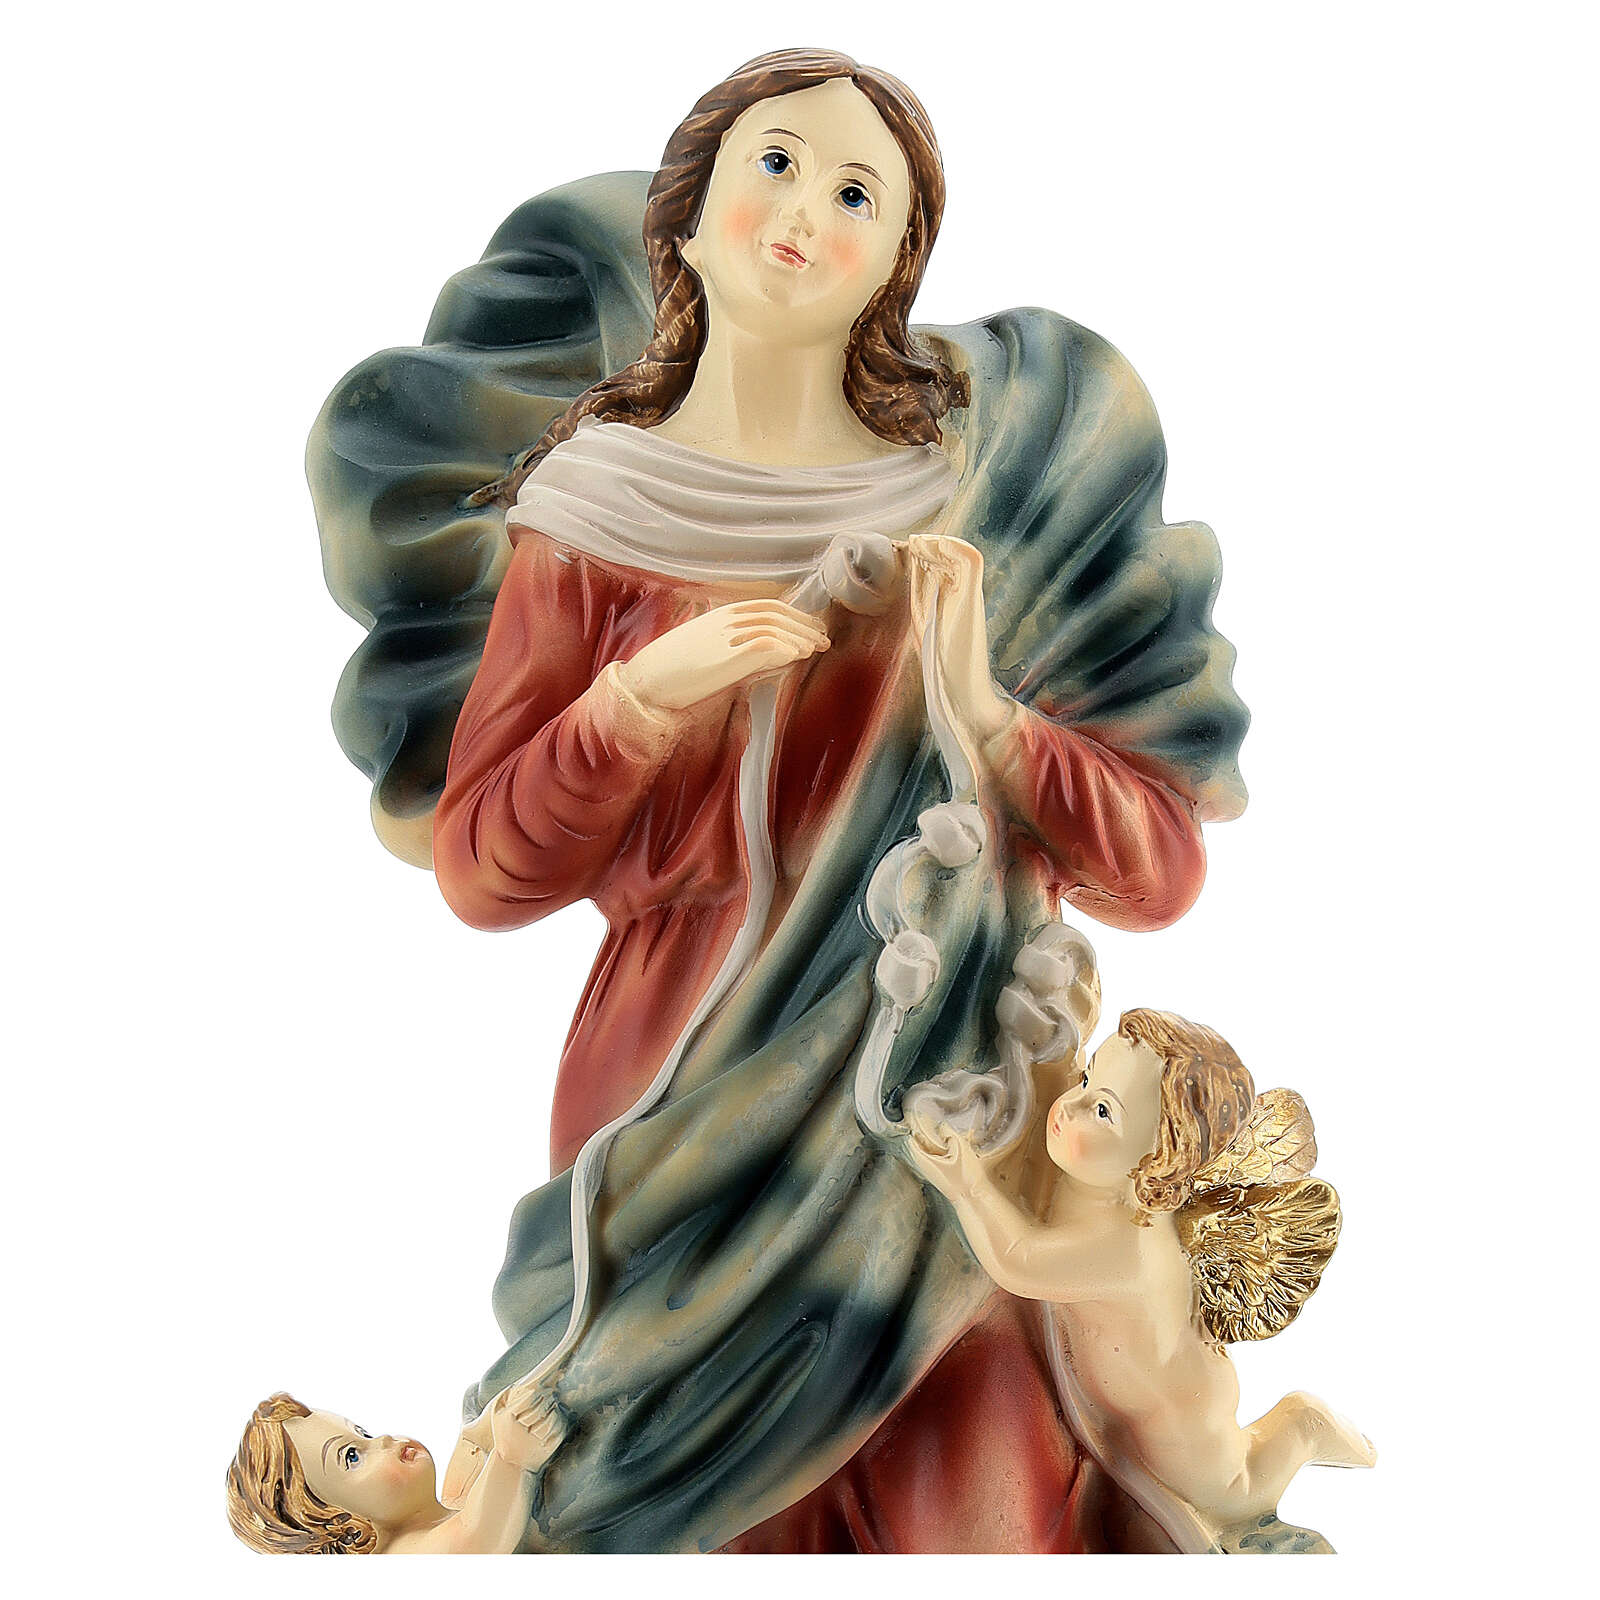 Maria che scioglie nodi angeli statua resina 31,5 cm 4